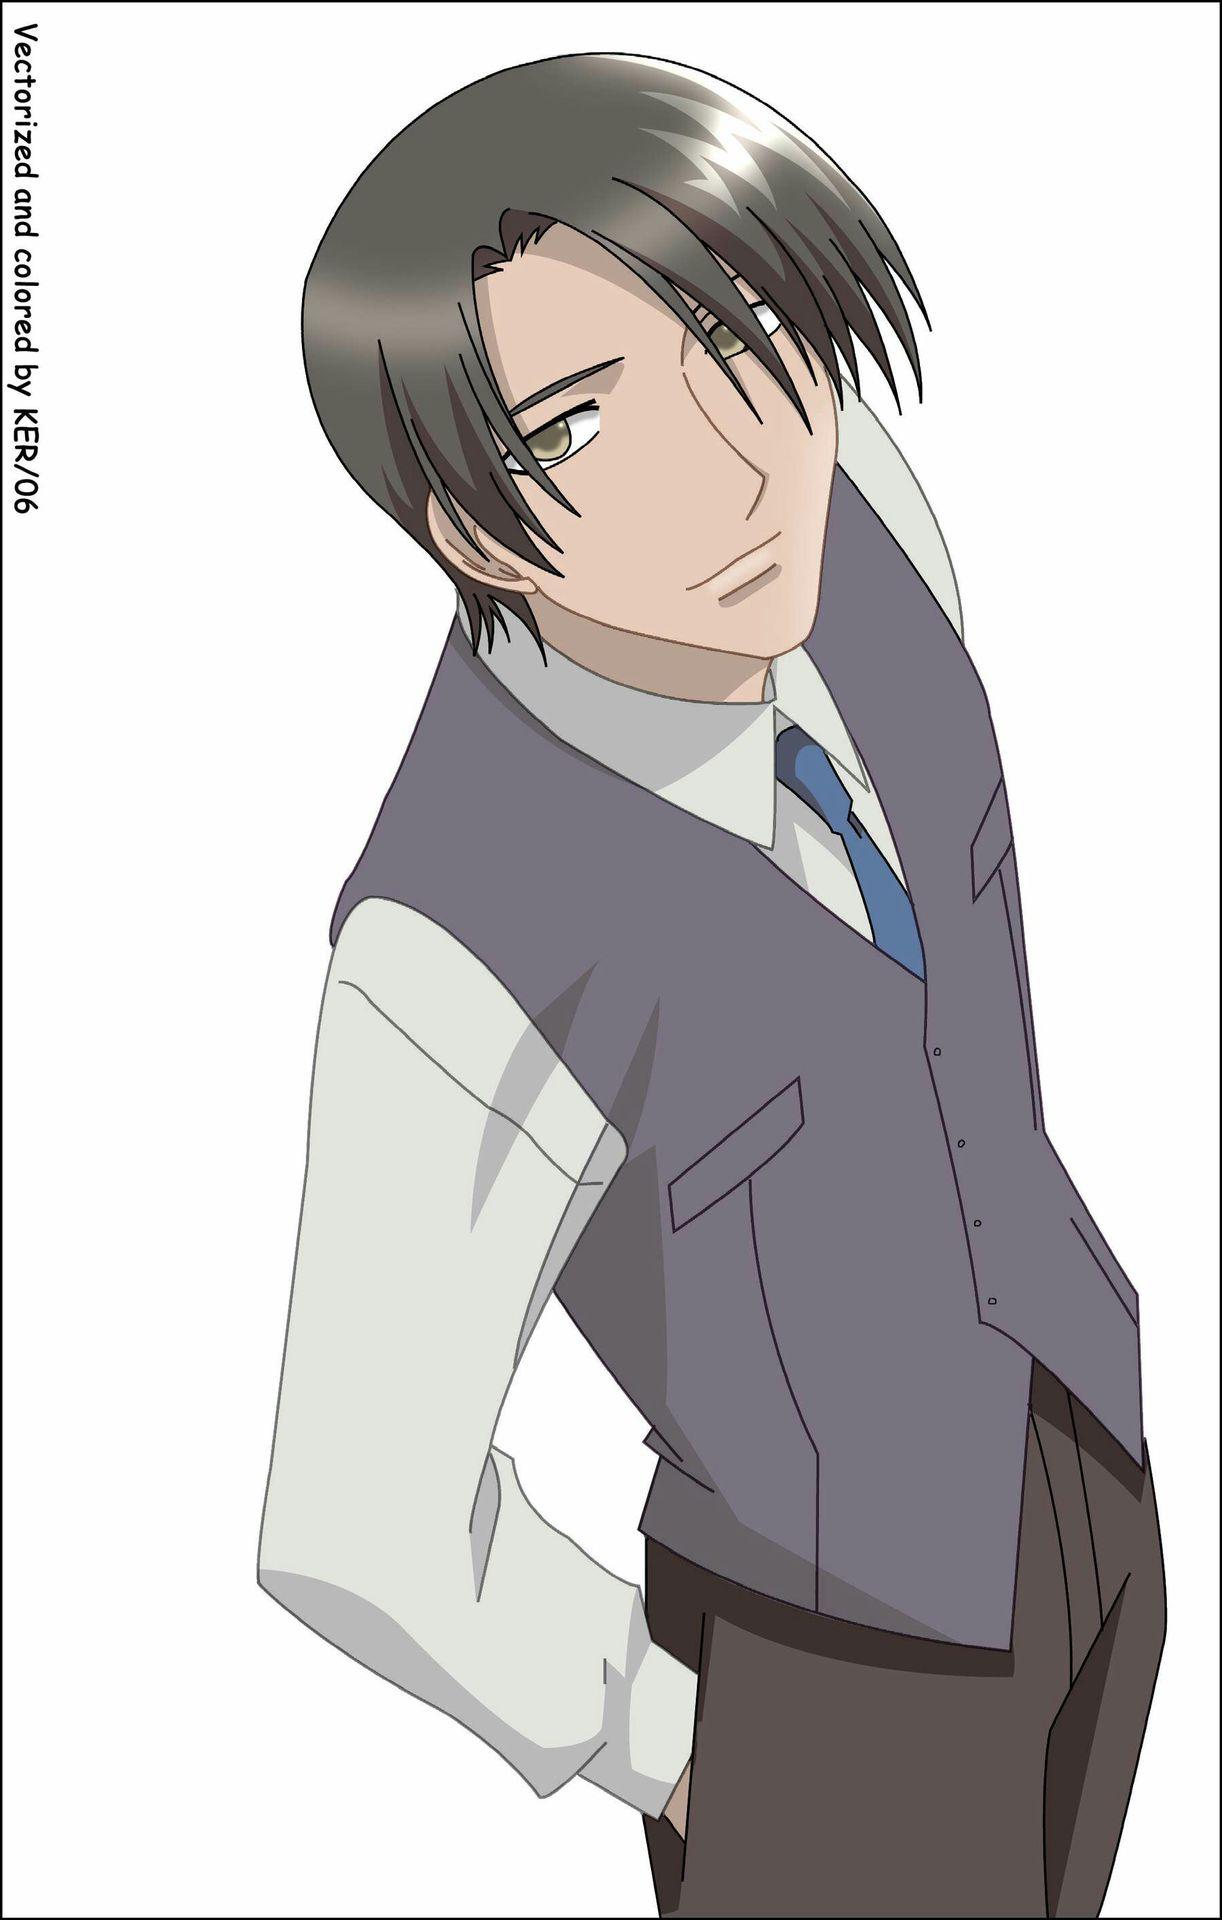 Anime Characters Reader Wattpad : Fruits basket boys reader hatori wattpad